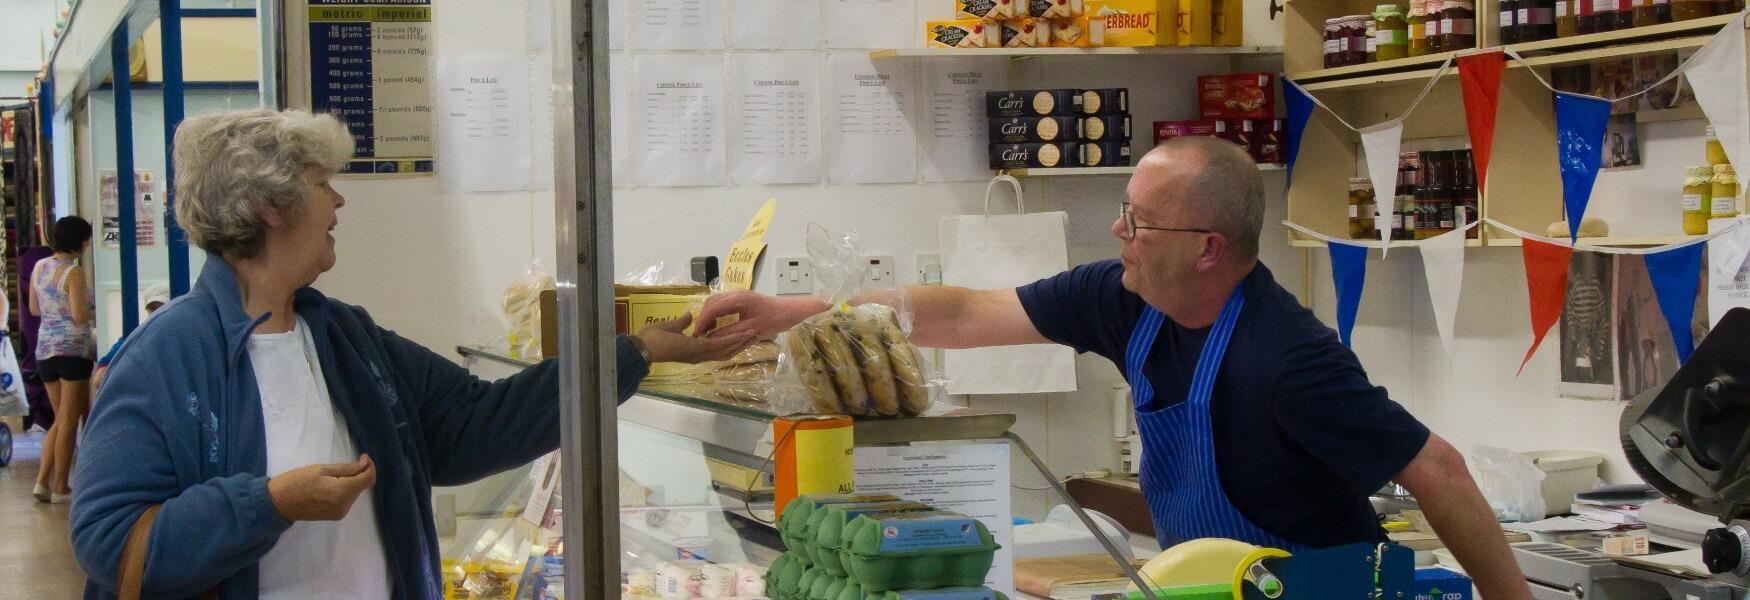 A market trader serving a customer.